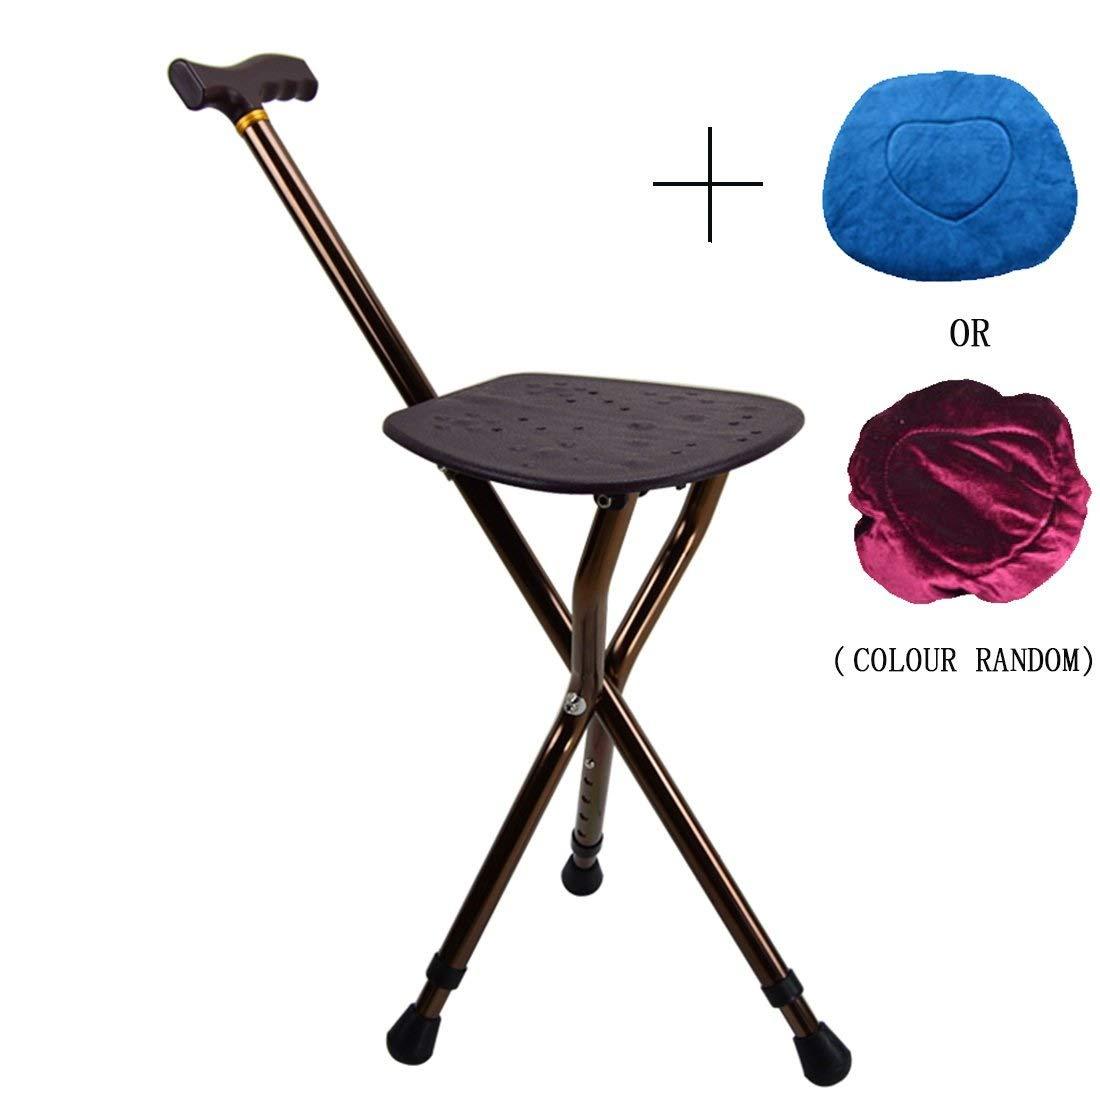 TLANG WALKER Walking Frame, Multifunctional Crutches Seat Folding Seat CaneAluminum AlloyHeight AdjustableDouble Height 5 Gear AdjustmentStatic Loading 150kg for Elderly Disabled